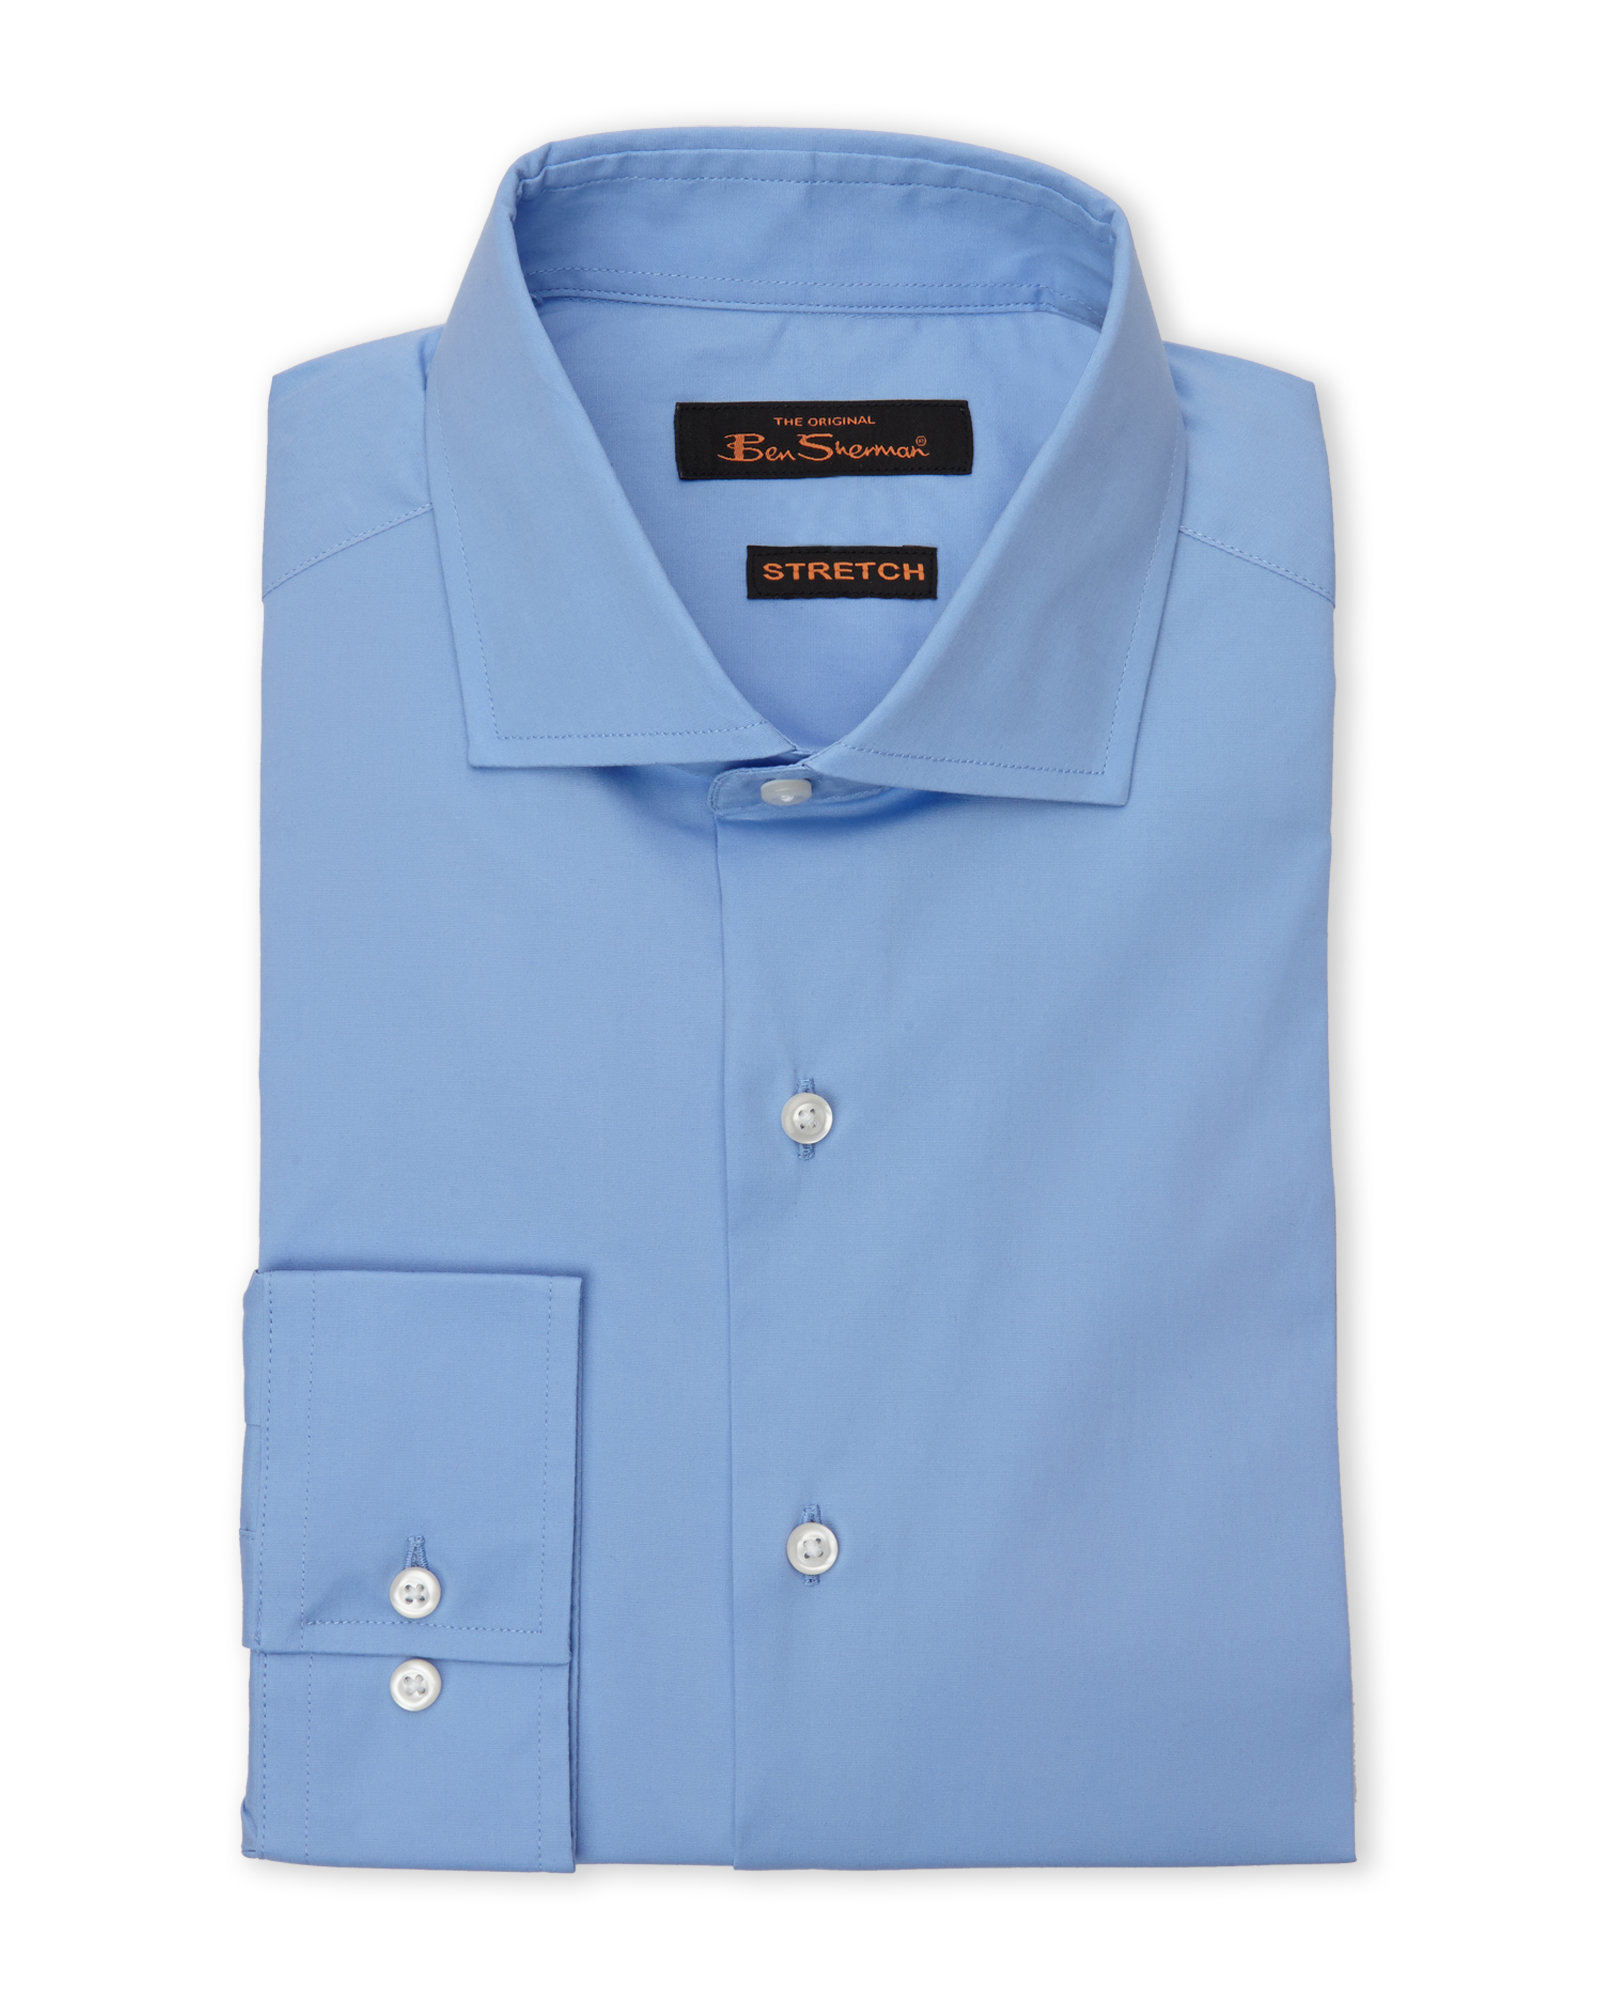 Ben sherman blue poplin stretch dress shirt in blue for for Century 21 dress shirts